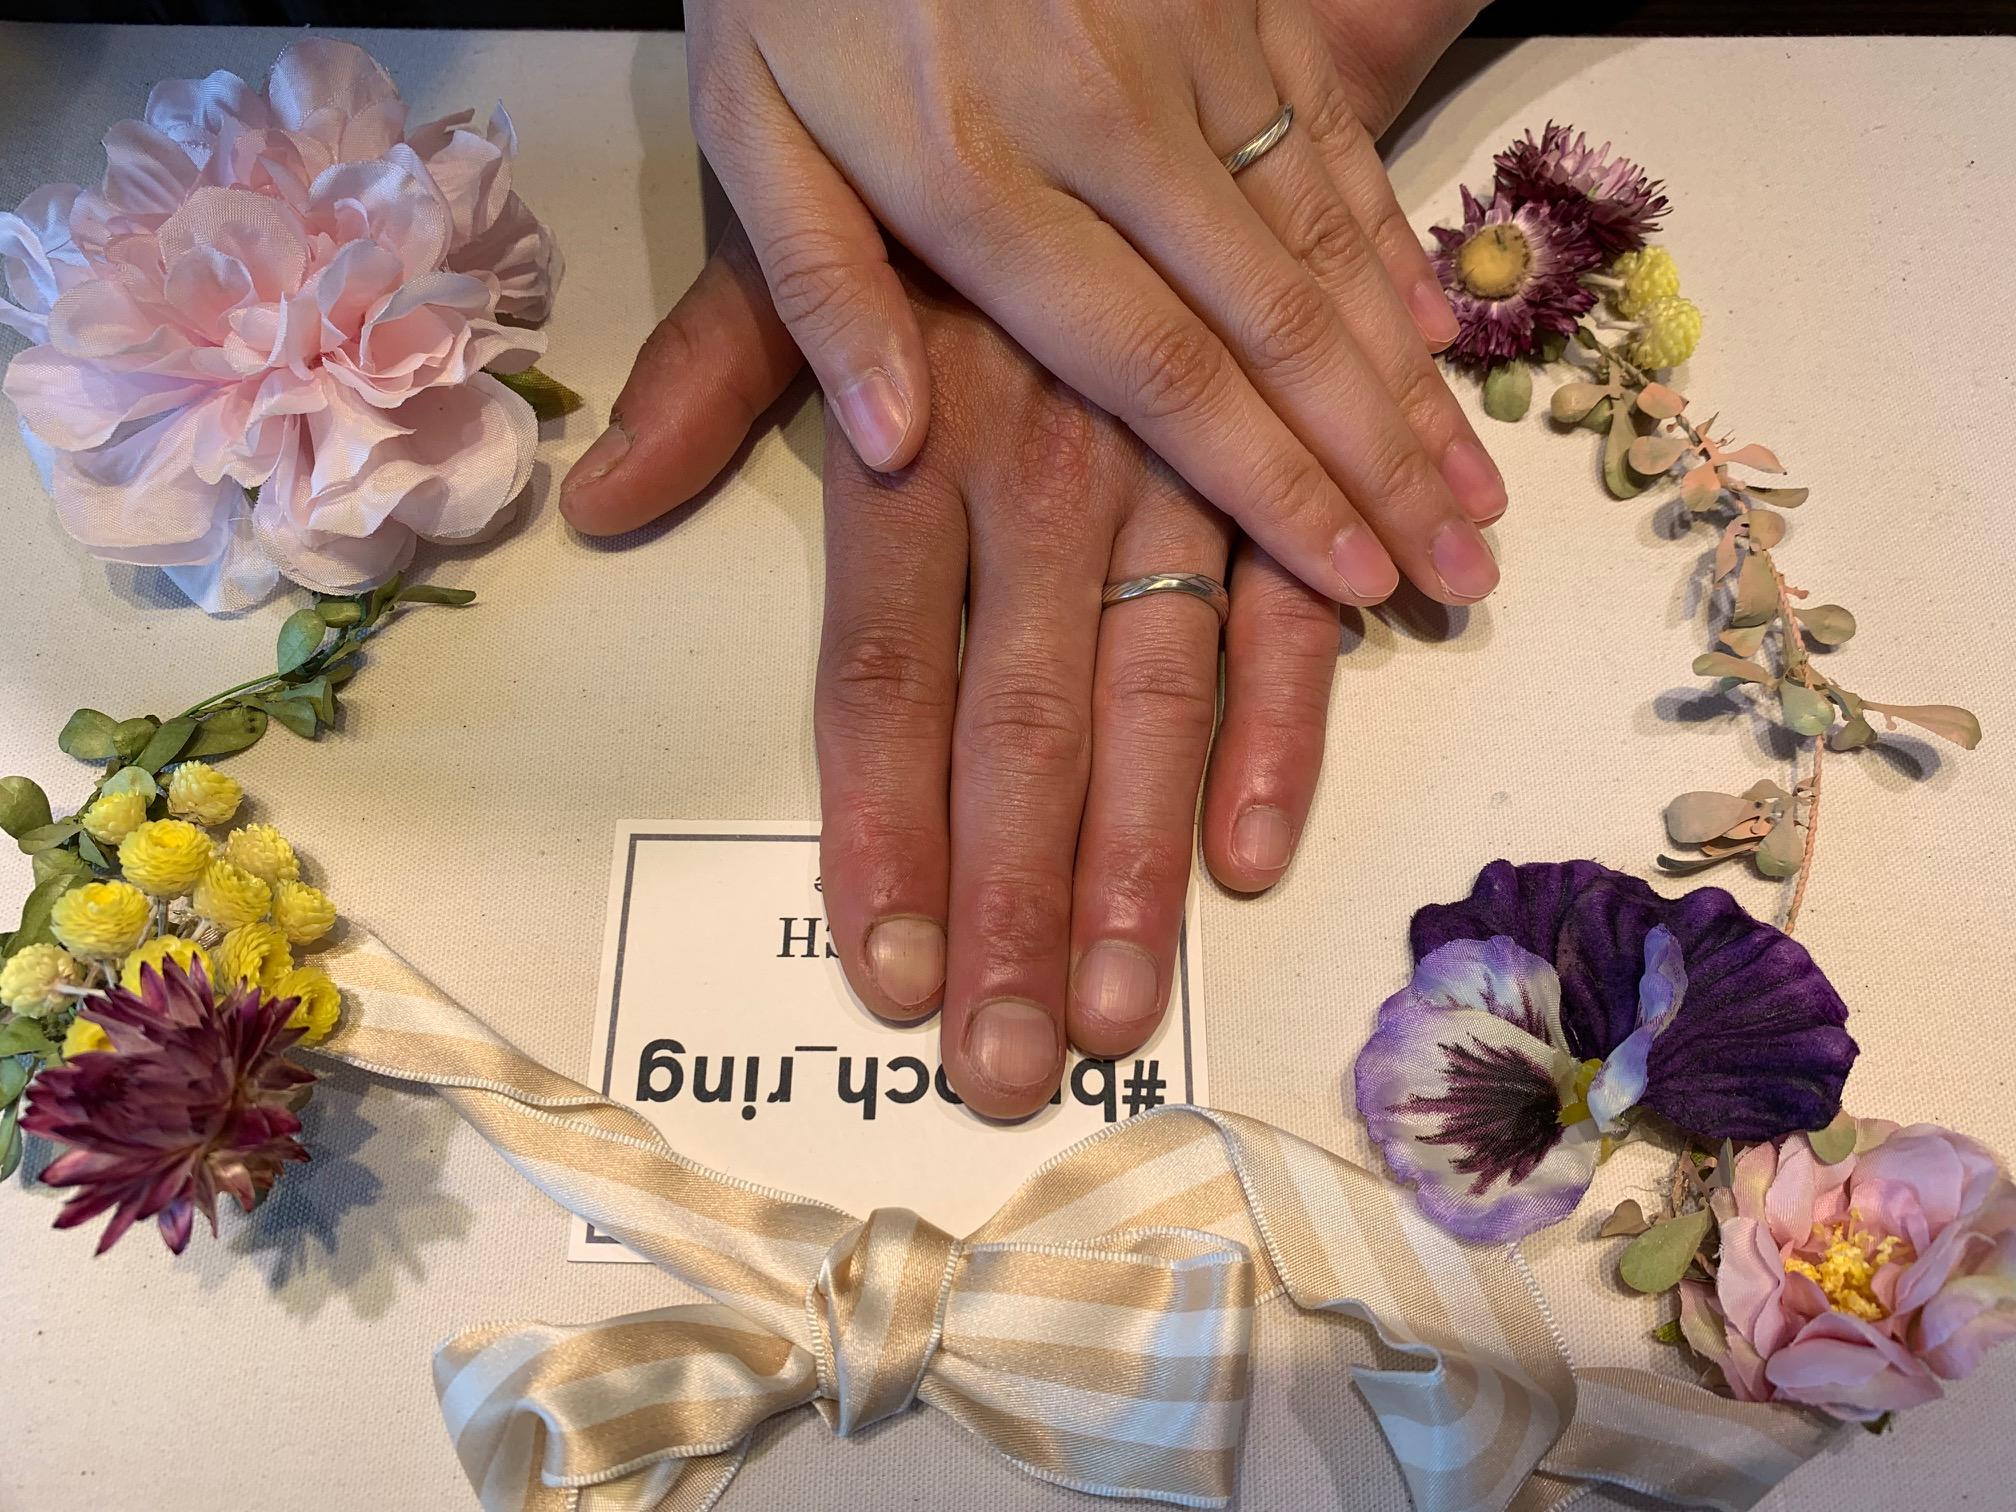 mokumeganeya杢目金屋BROOCHブローチ新潟結婚婚約マリッジエンゲージ指輪リングブライダル花嫁恋風こいかぜ和風